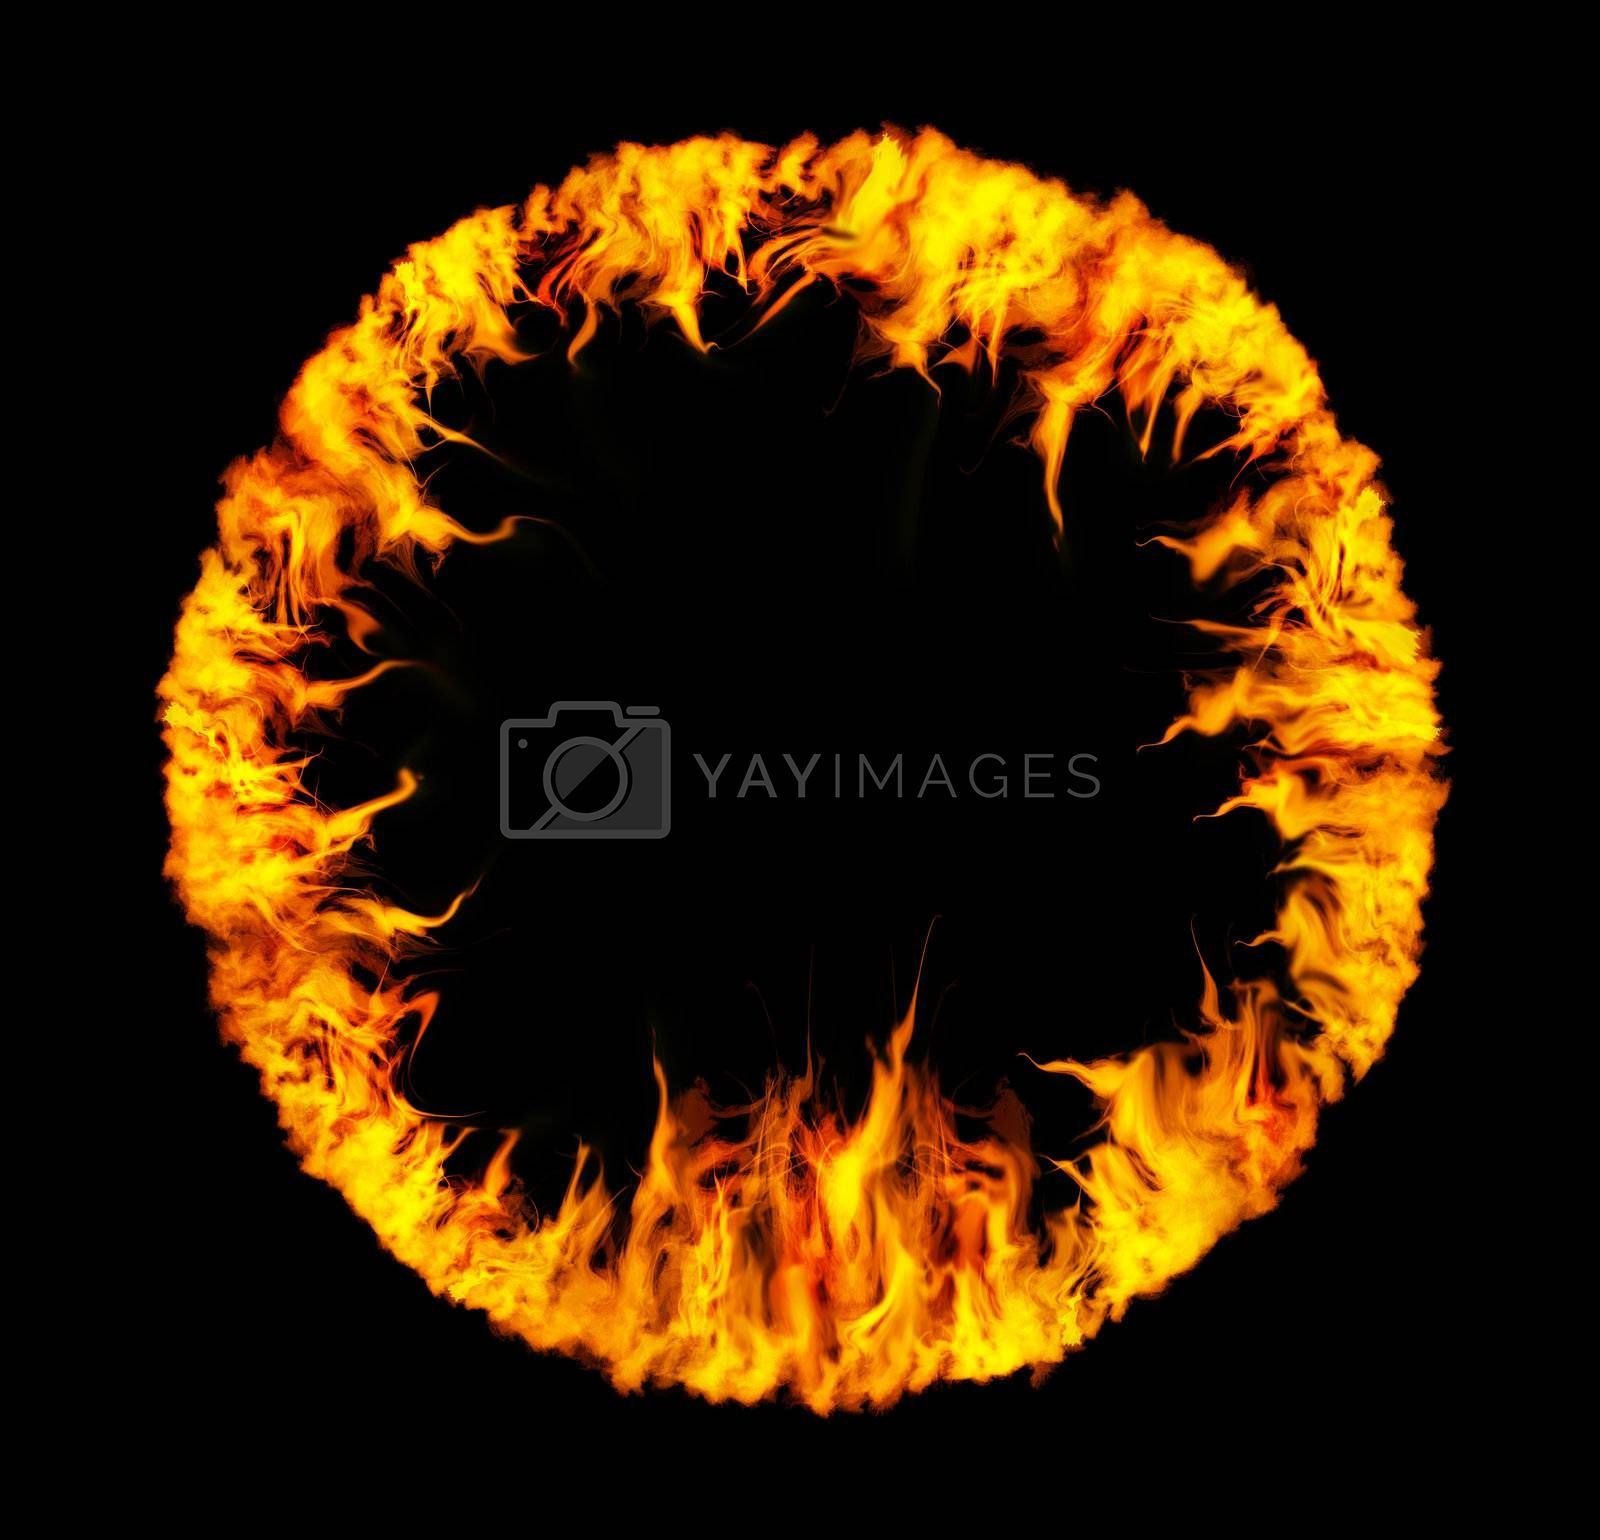 Ring of wavig fire on black background